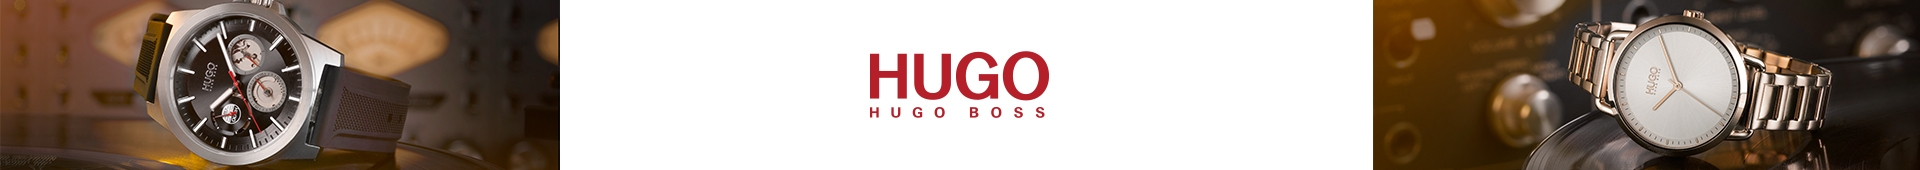 HUGO Ladies